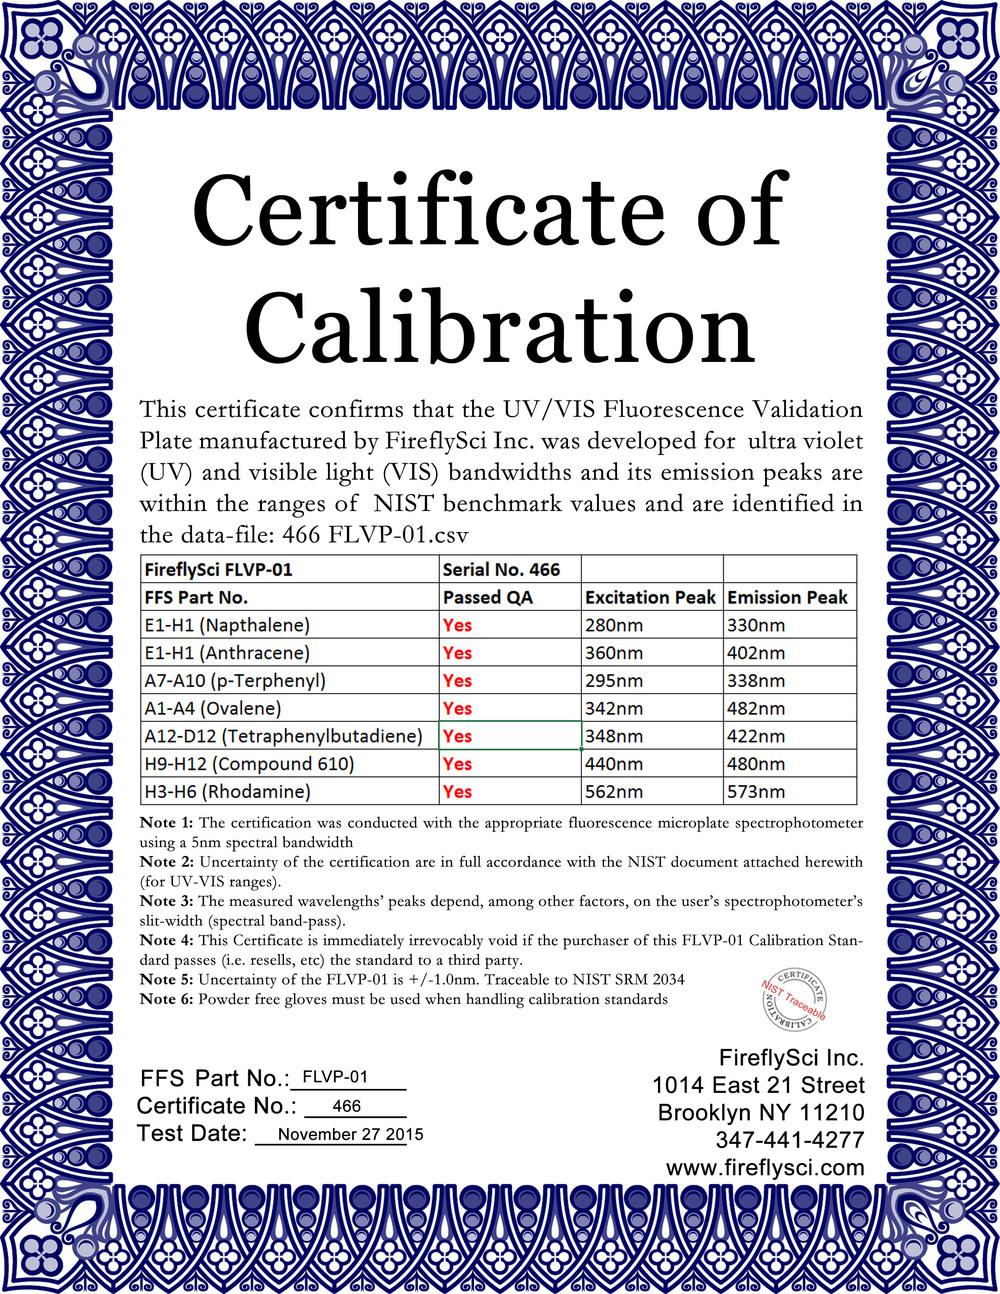 FLVP-01 Sample Certificate of Calibration